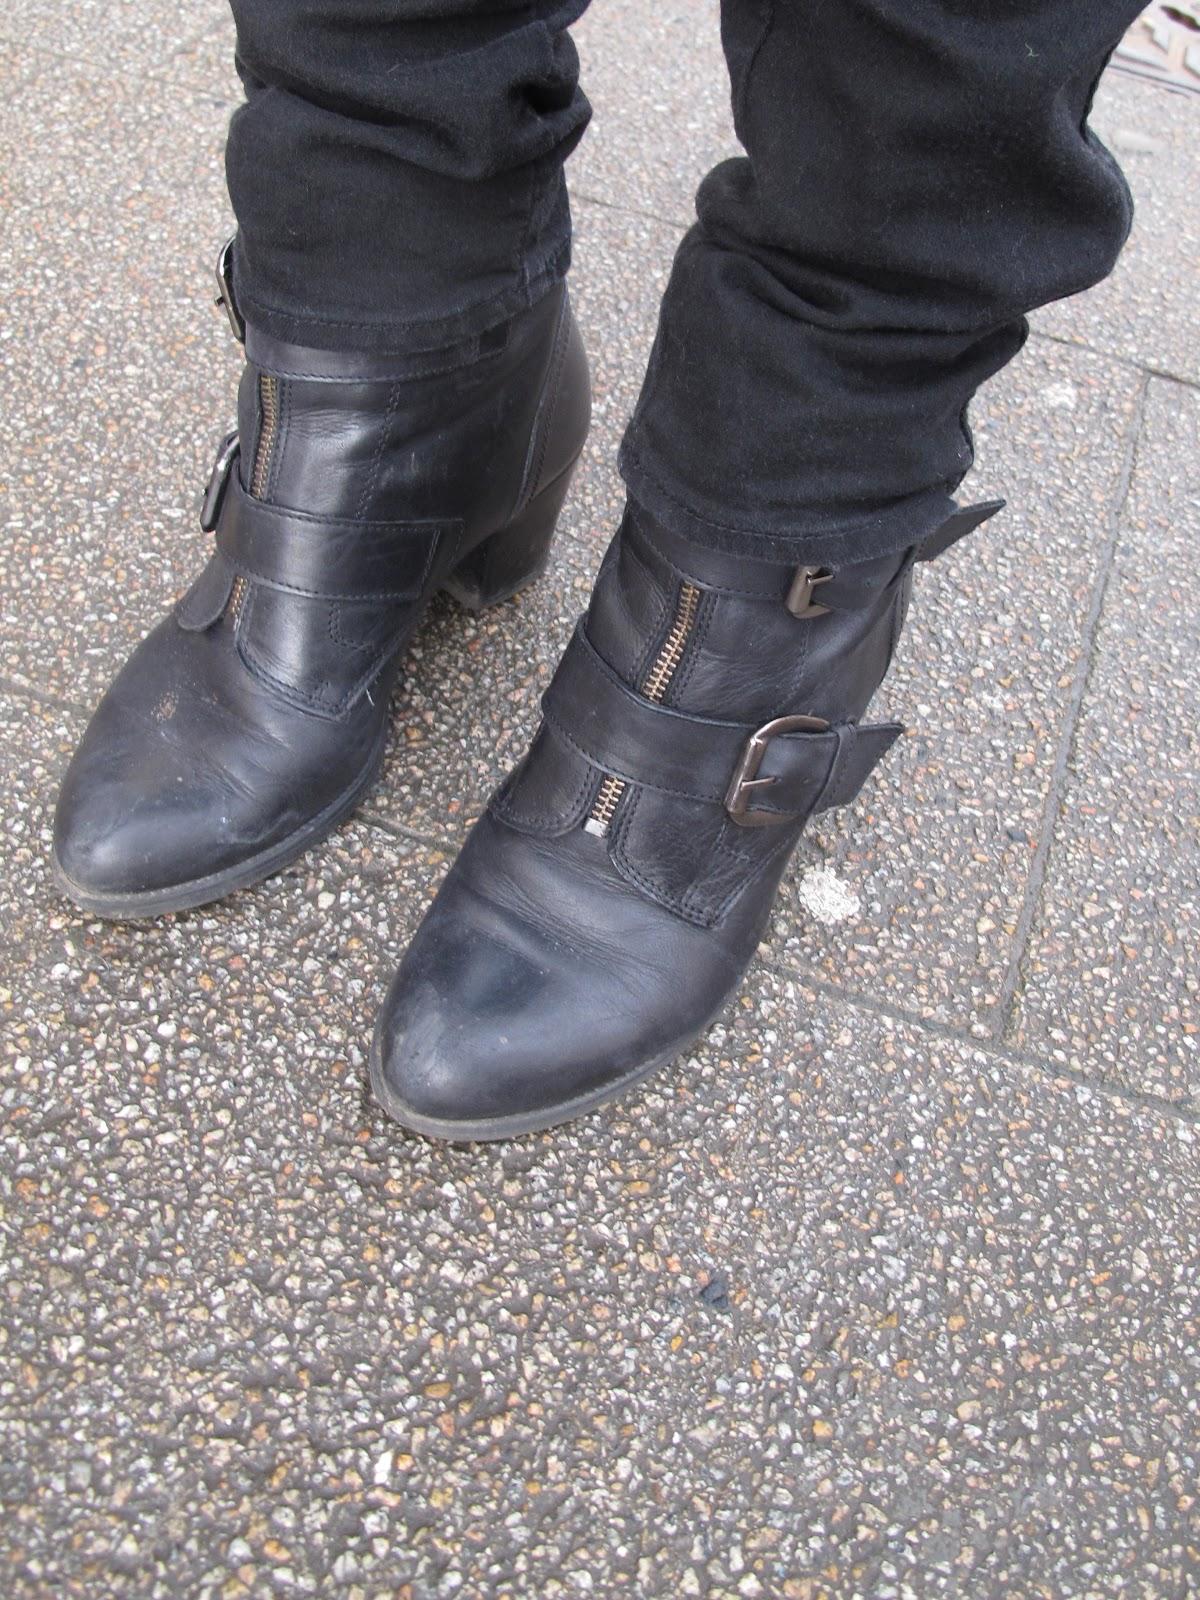 http://3.bp.blogspot.com/-Kxm4DFCLST0/UOJZRf6ExRI/AAAAAAAAA2A/JJhJRQsxrQM/s1600/boots.jpg